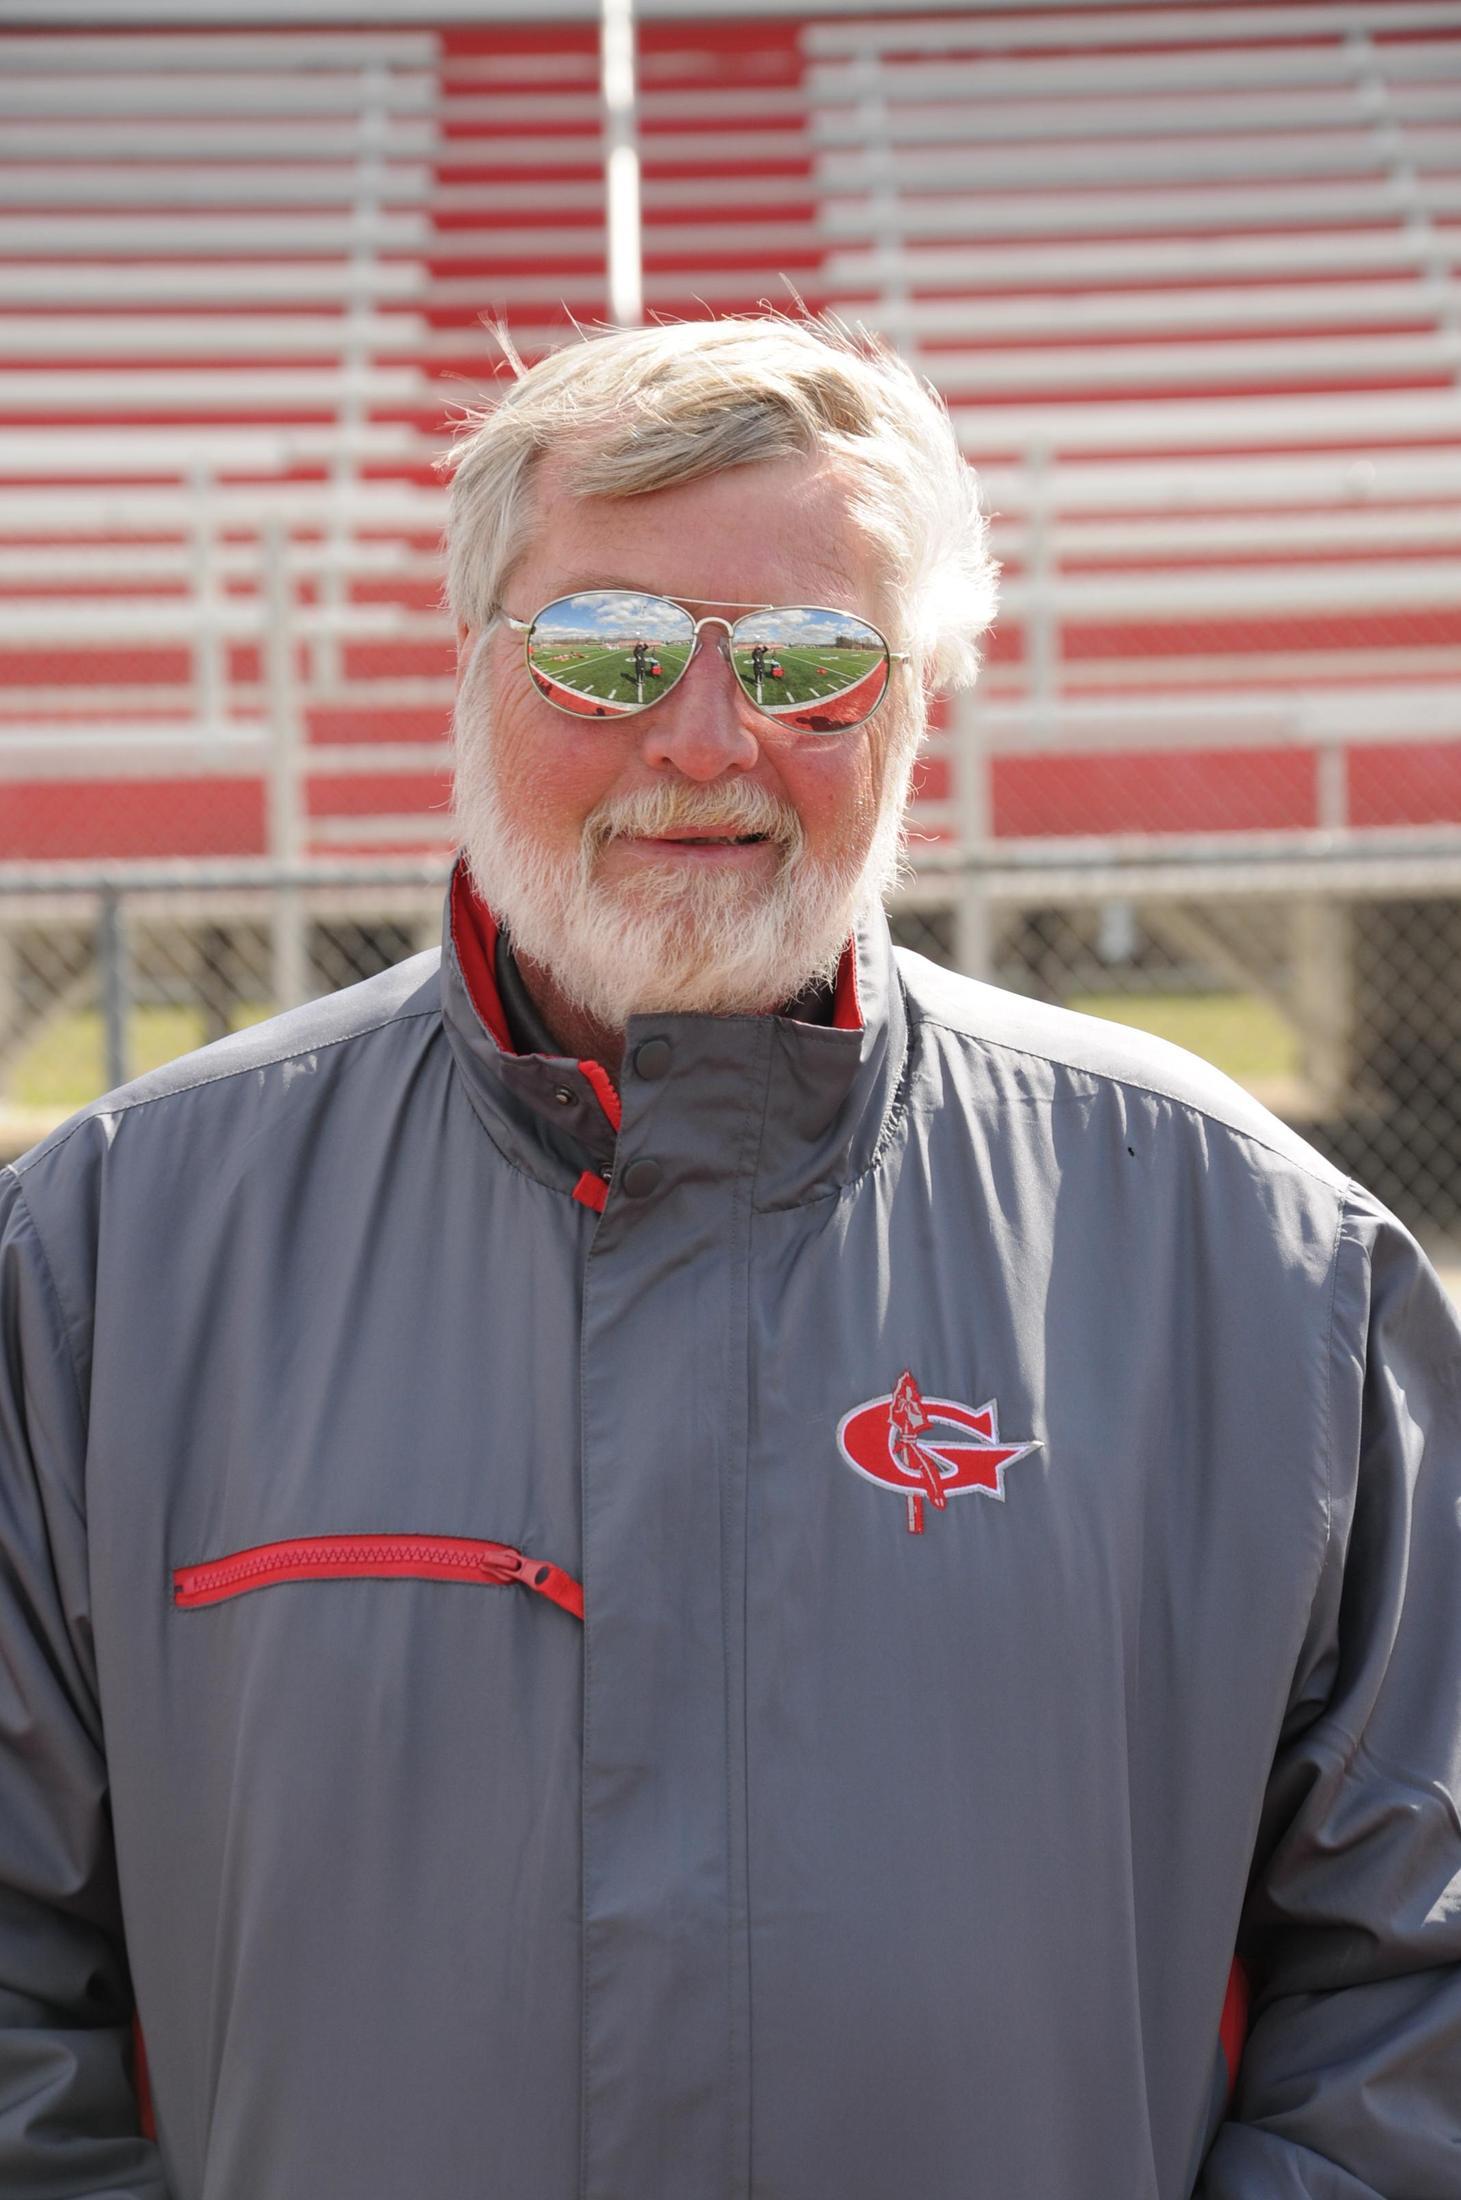 Coach Rutter